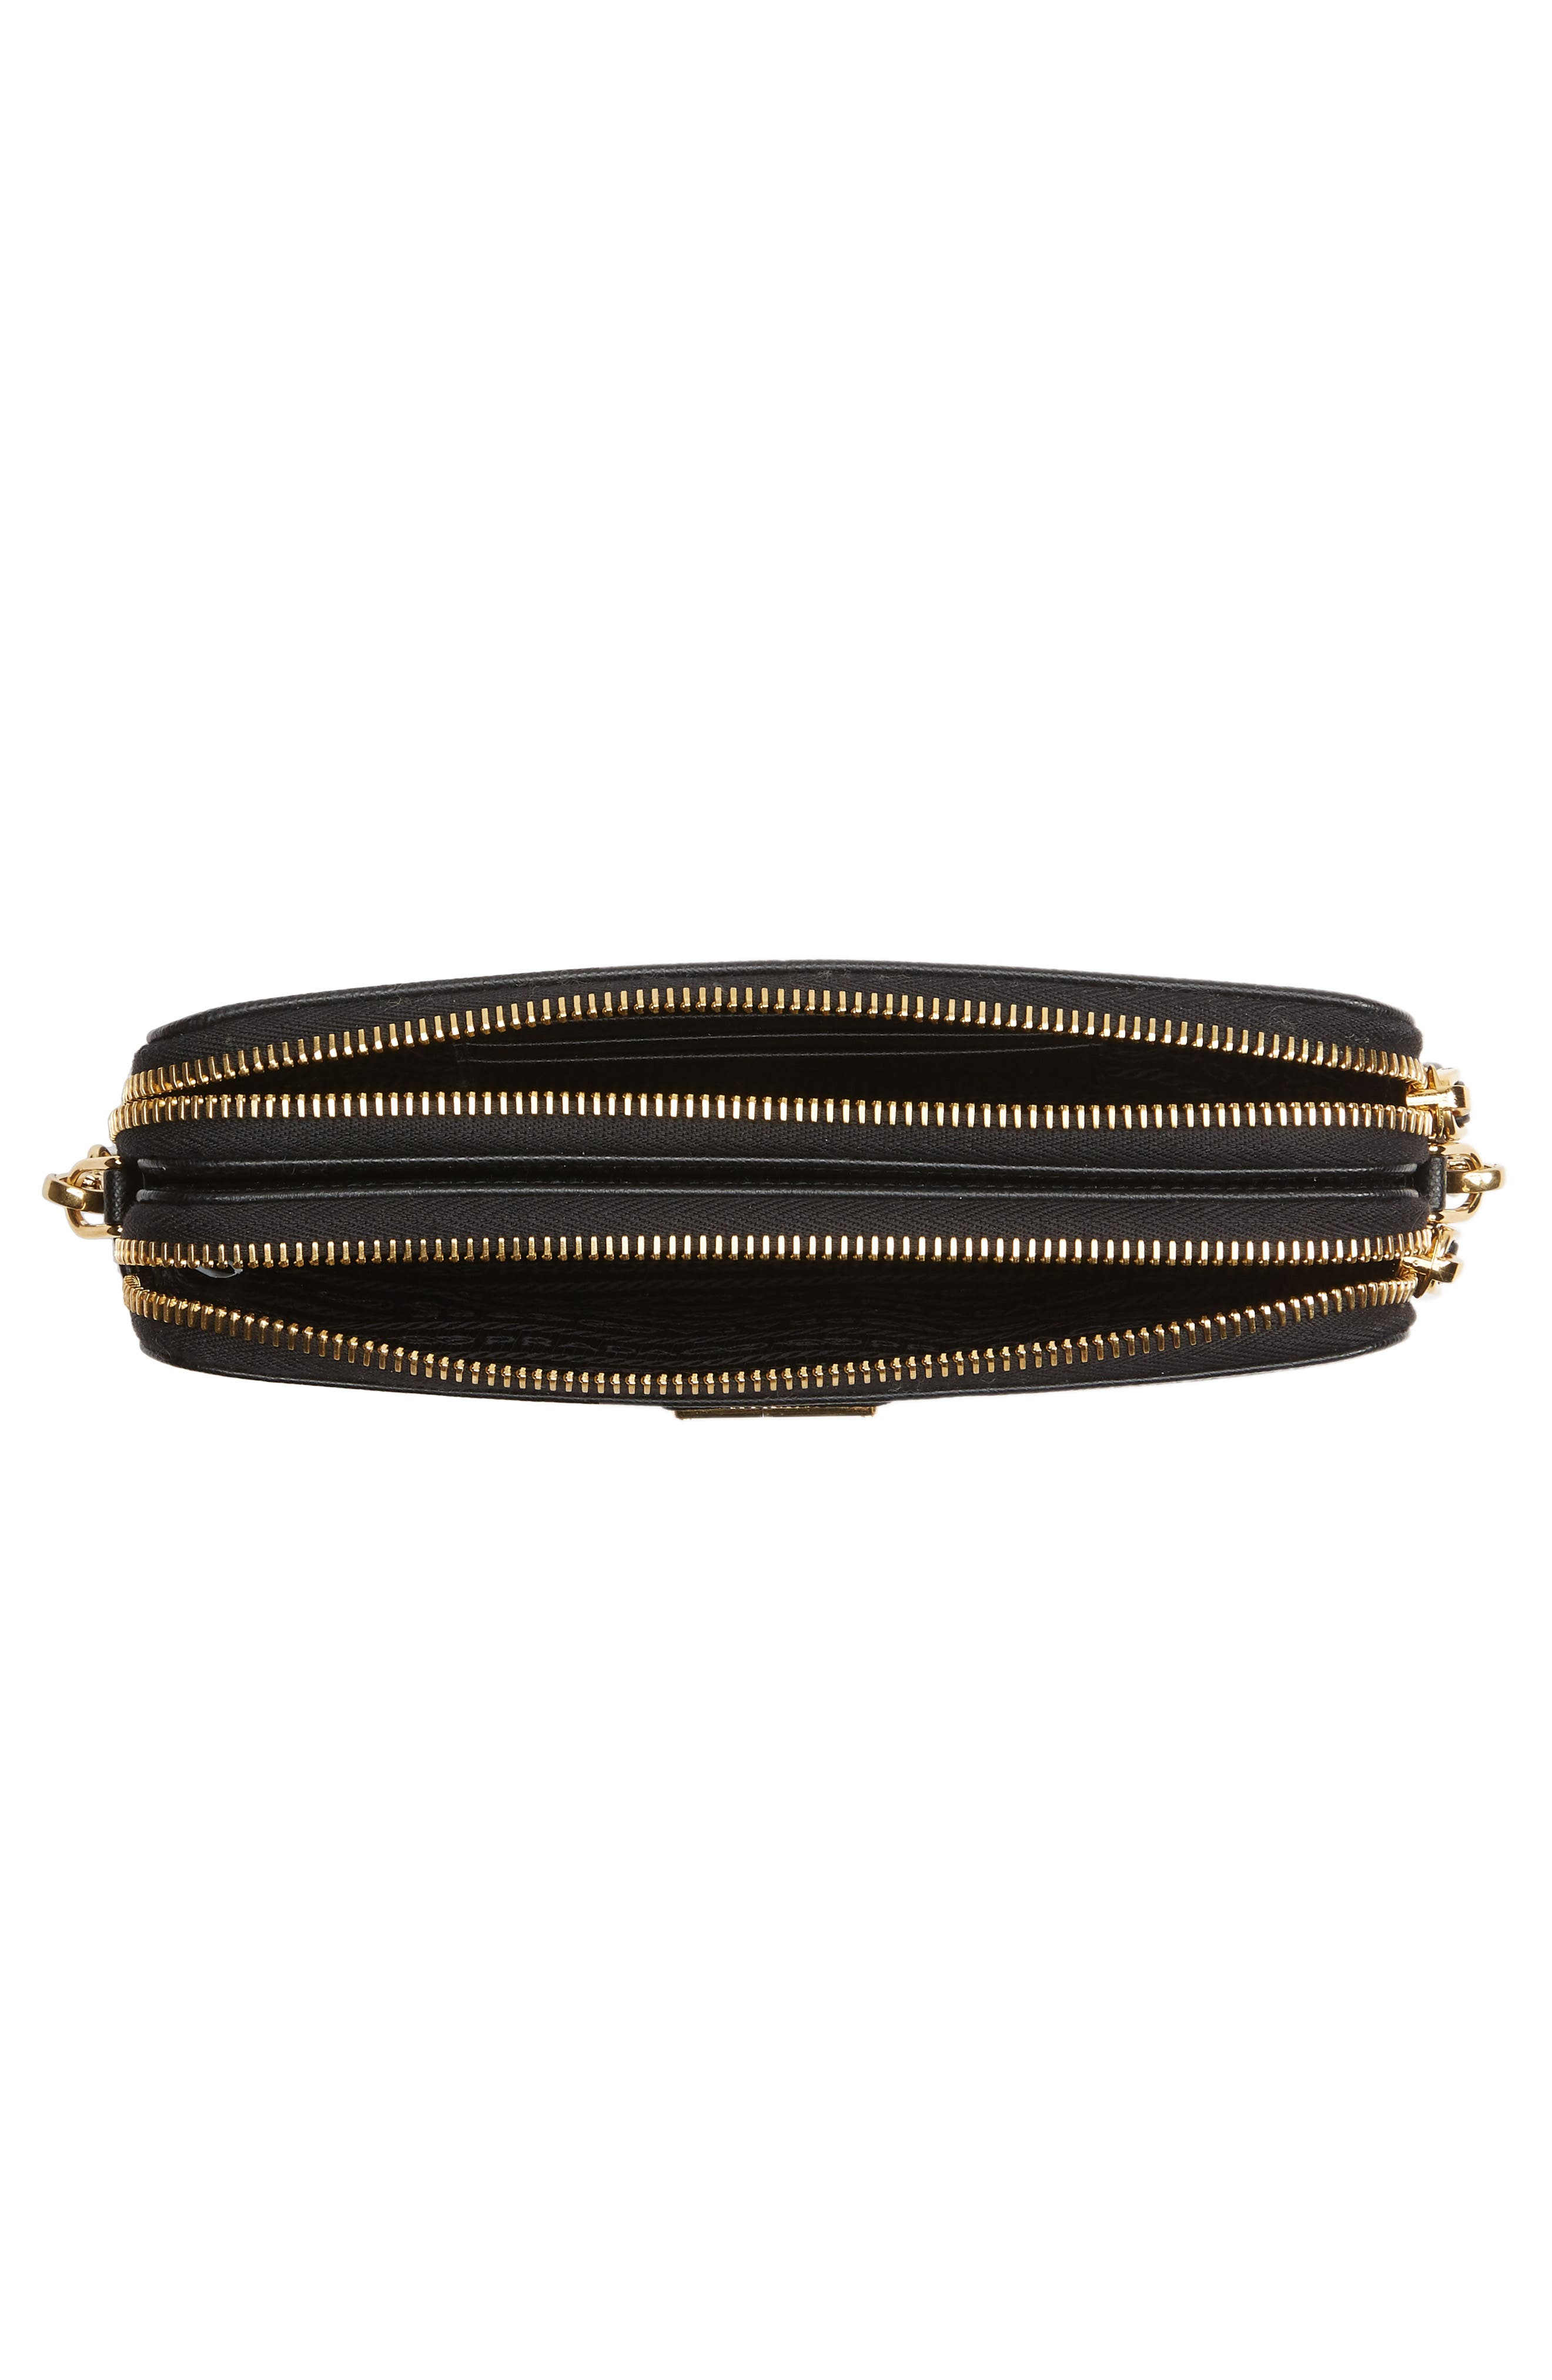 Small Double Compartment Zip Saffiano Leather Crossbody Bag,                             Alternate thumbnail 4, color,                             NERO